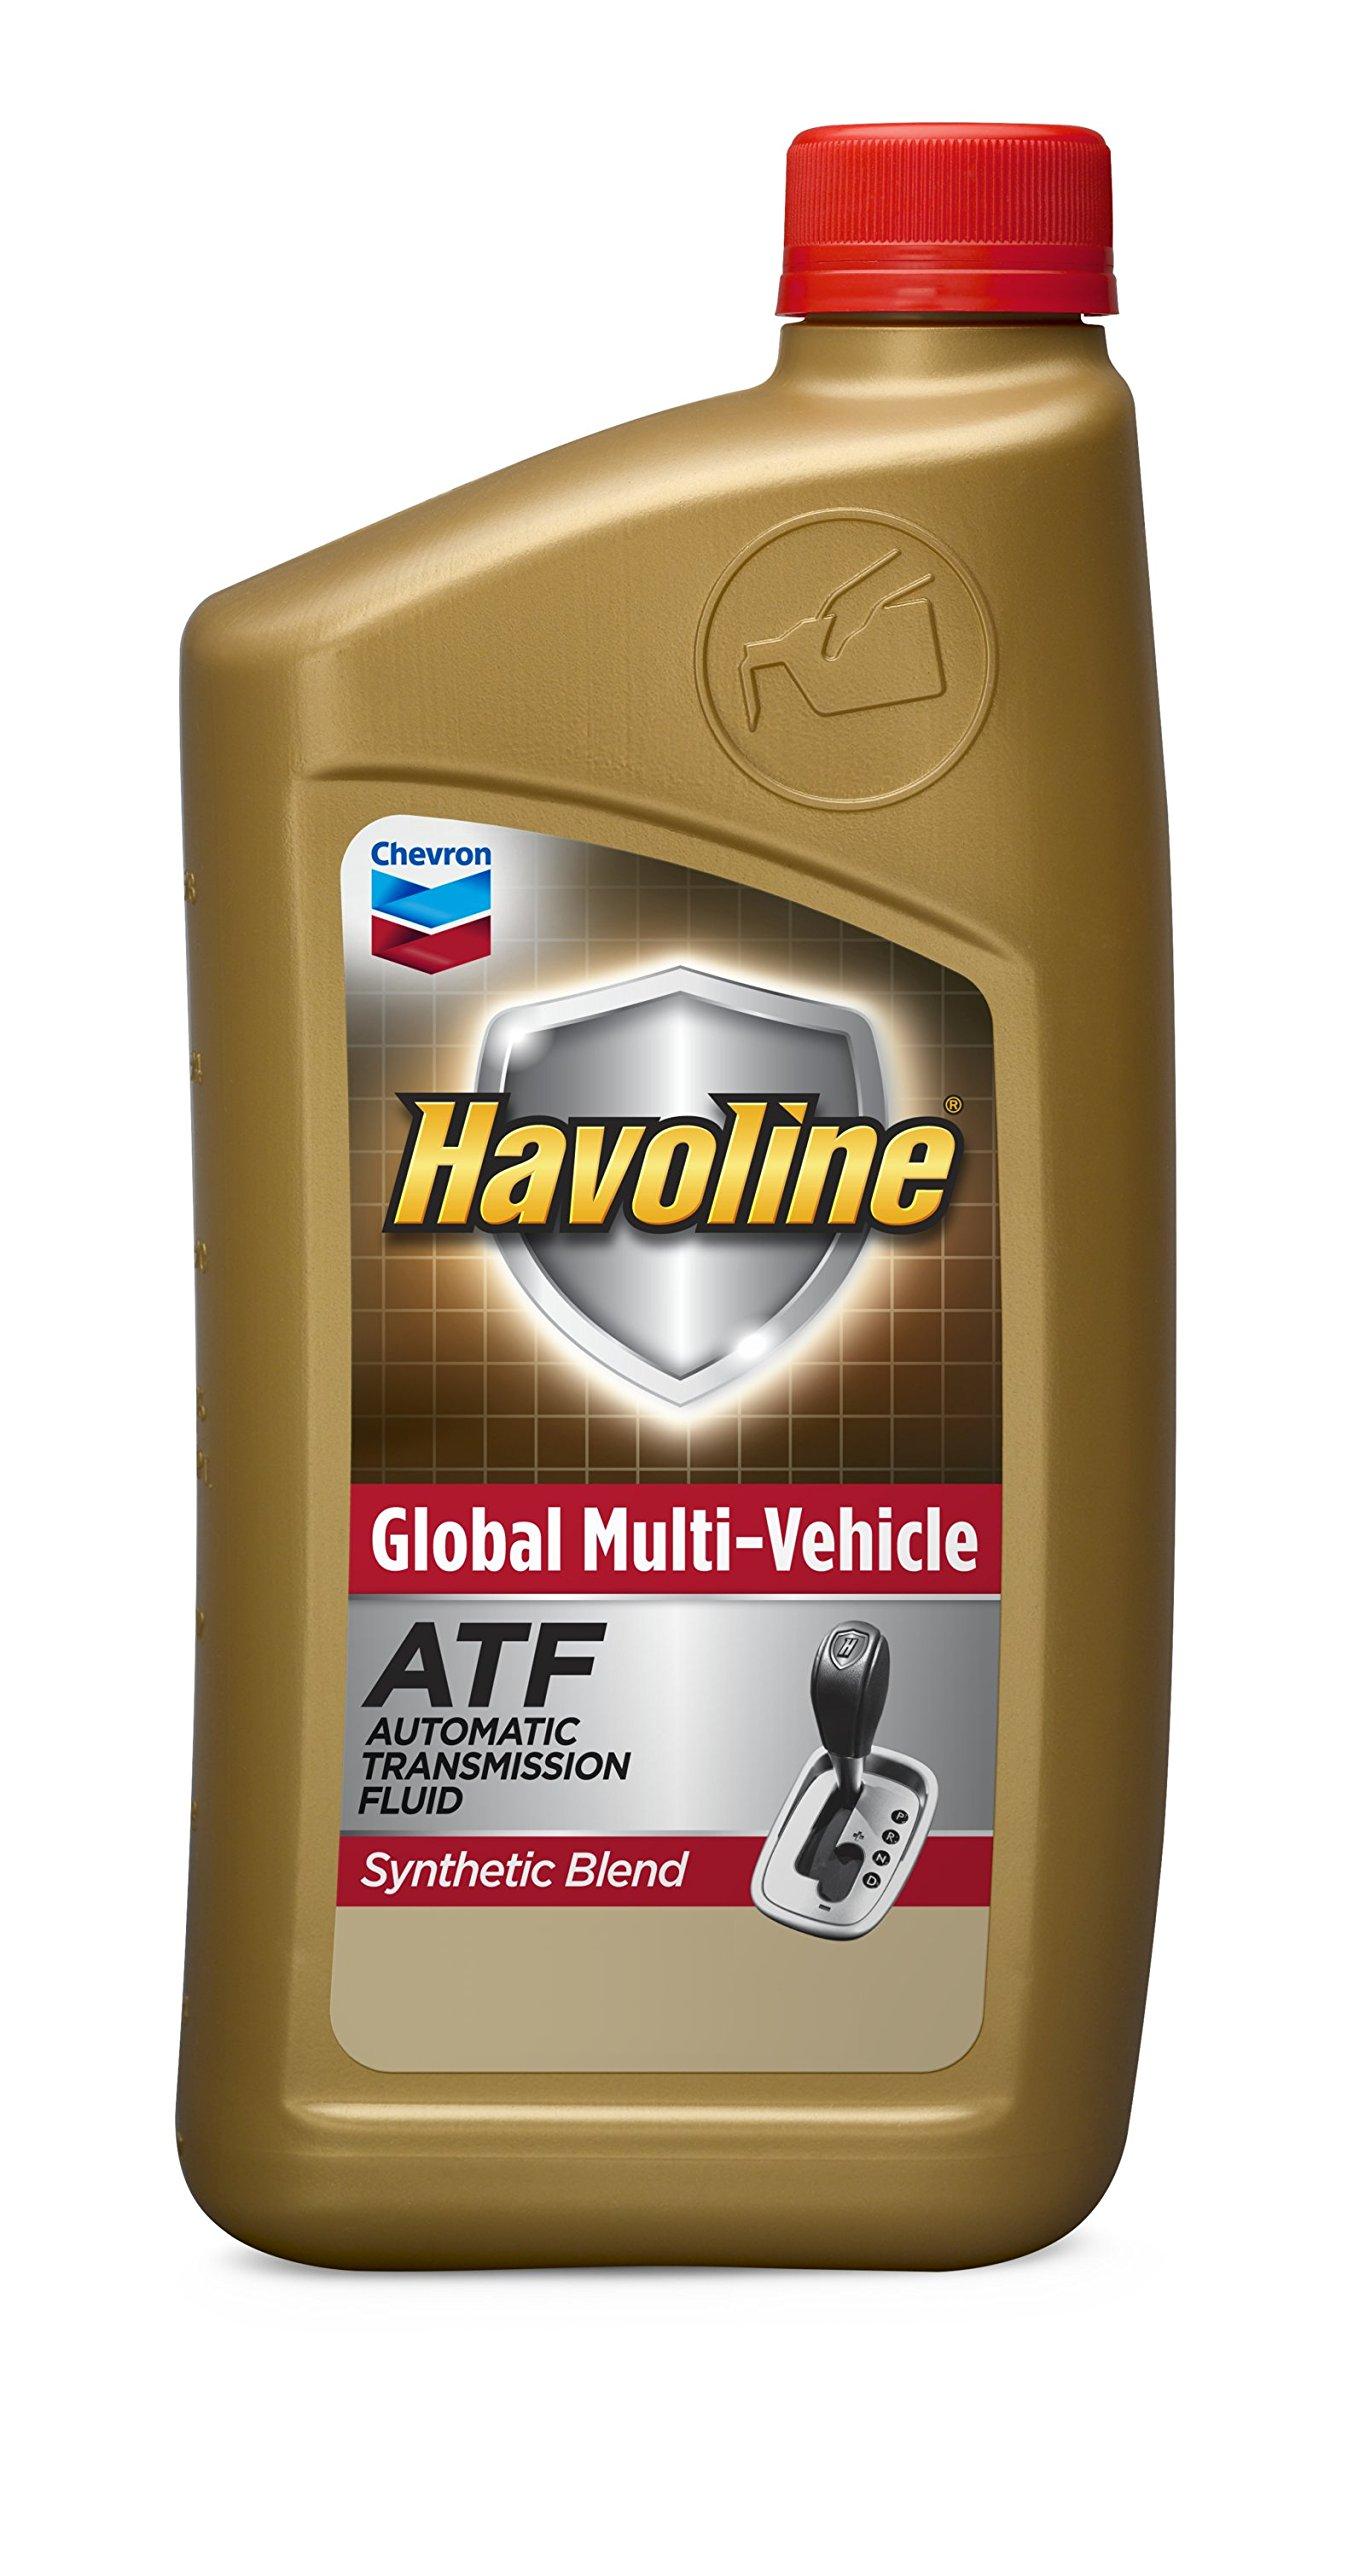 HAVOLINE 226537482-6pk Global Multi-Vehicle ATF-1 Quart (Pack of 6), 192. Fluid_Ounces, 12 Pack by HAVOLINE